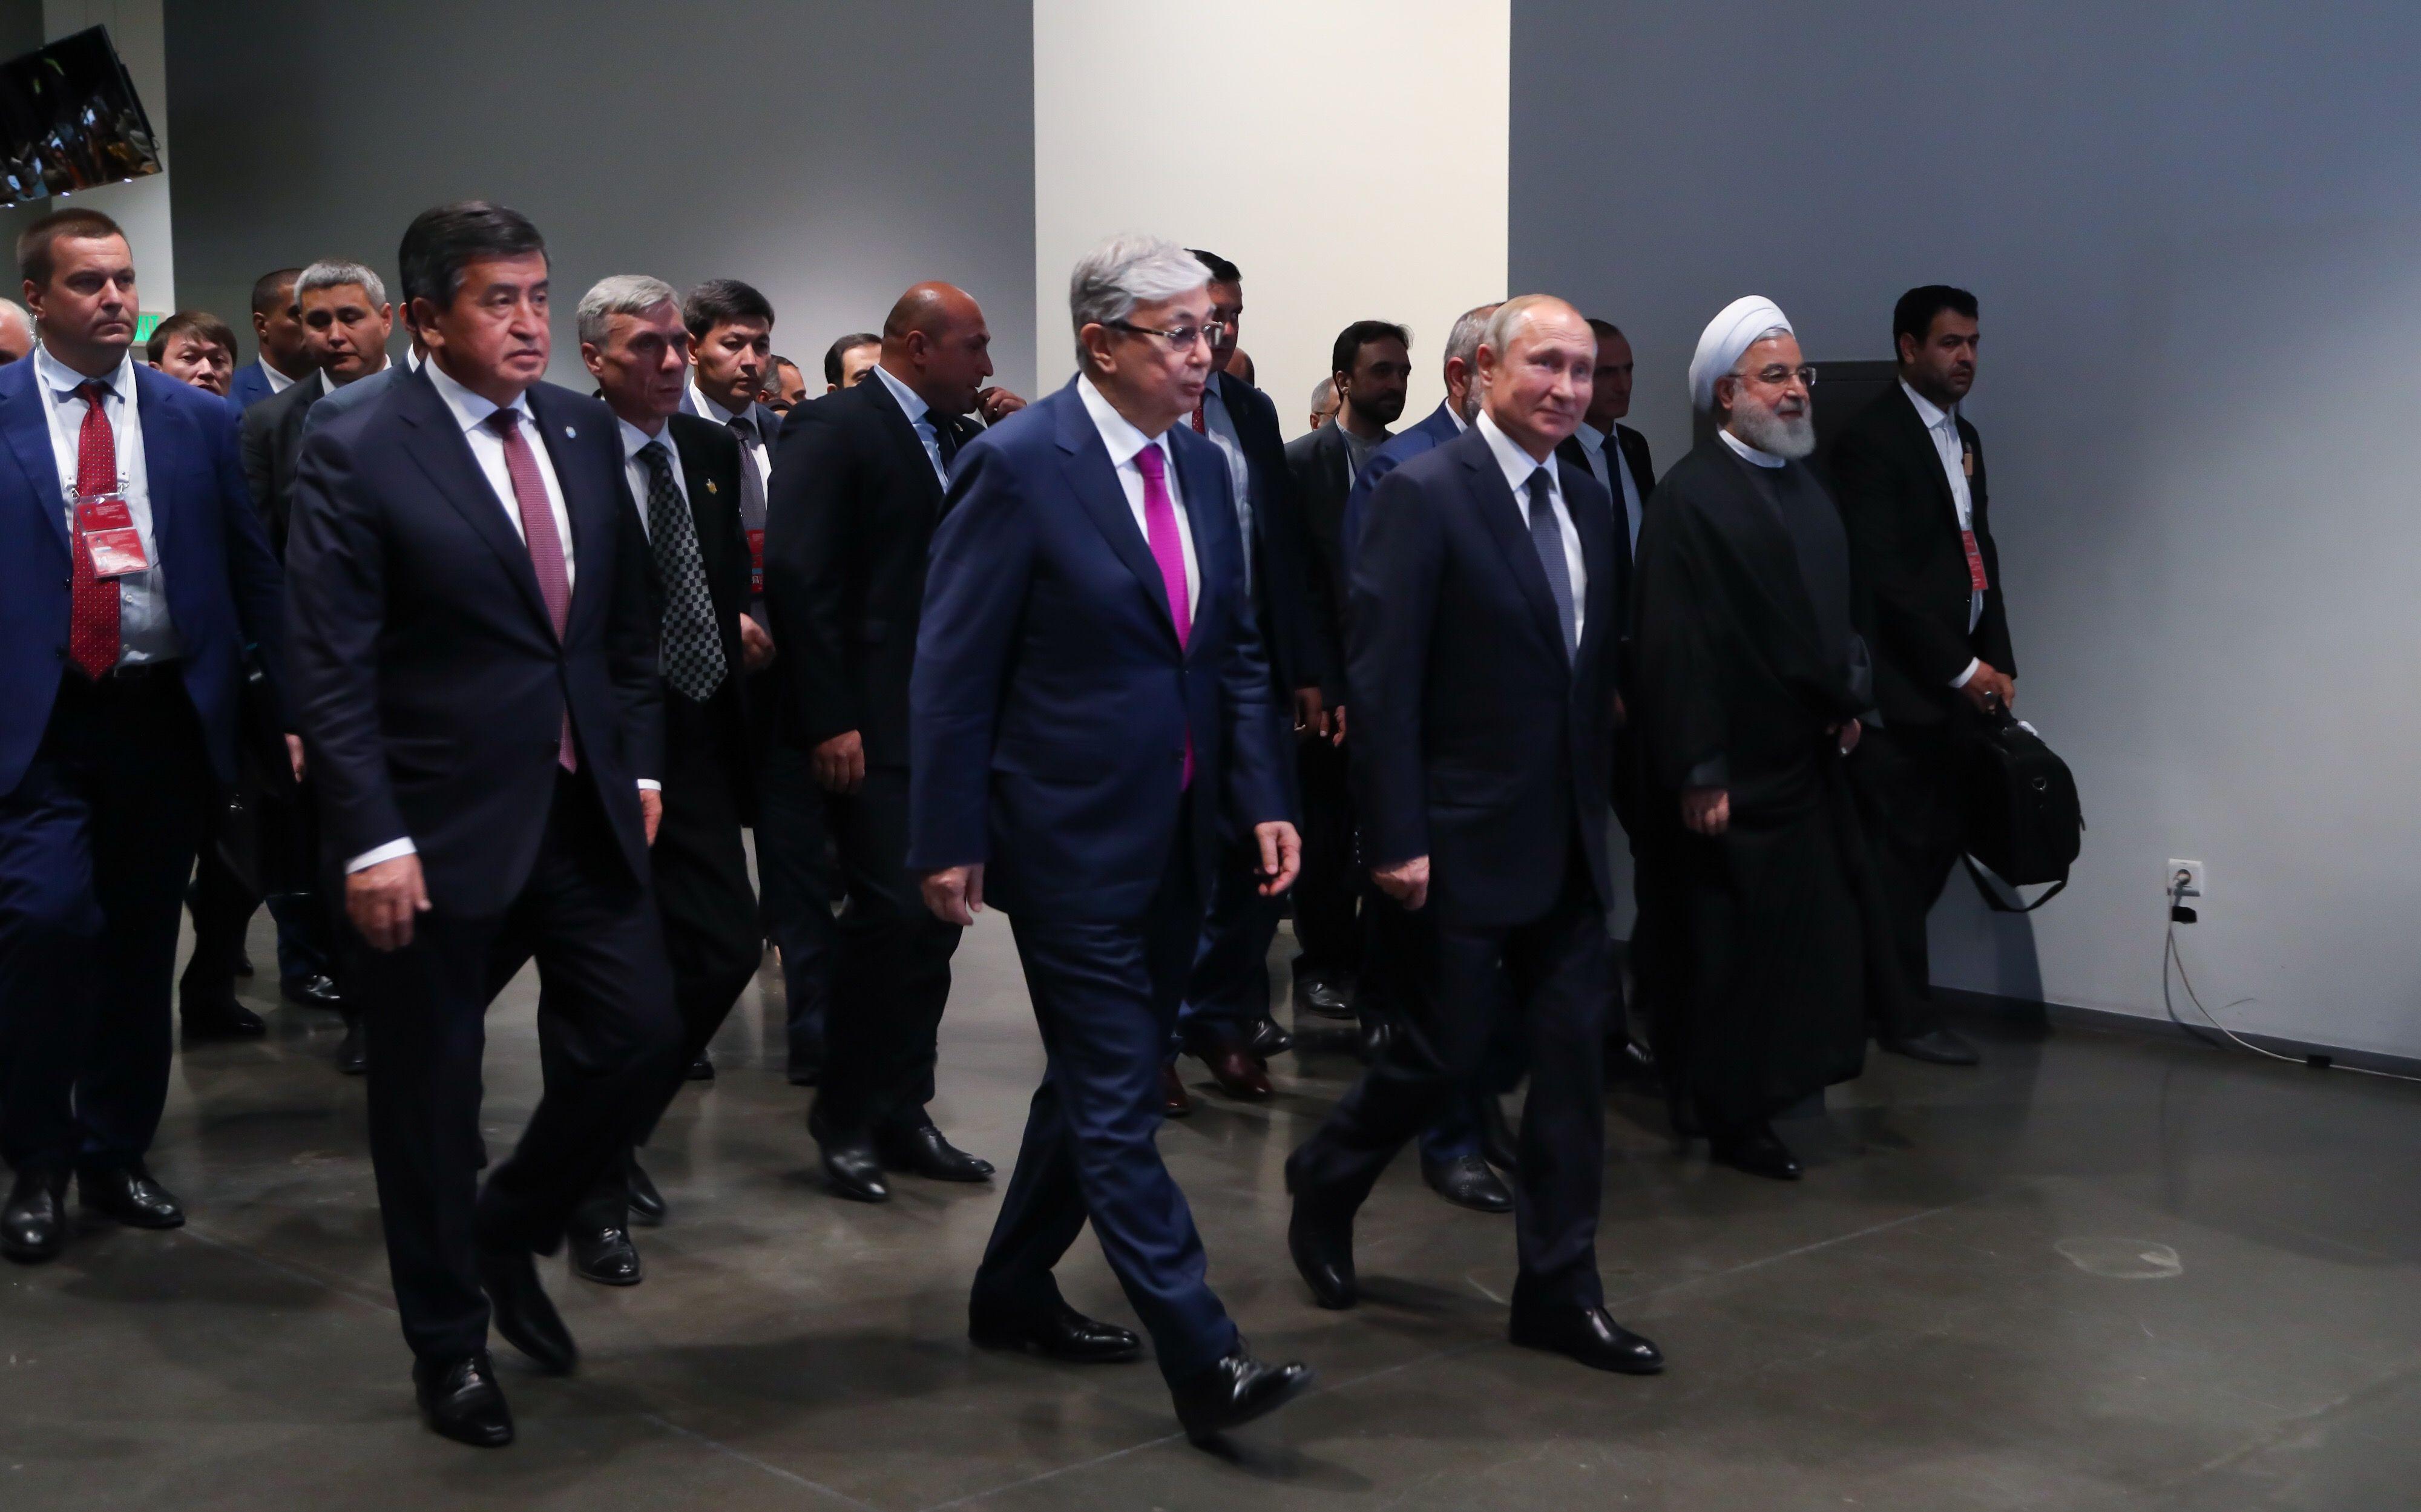 Глава государства принял участие в форуме «Транзитный потенциал Евразийского континента»- Kapital.kz